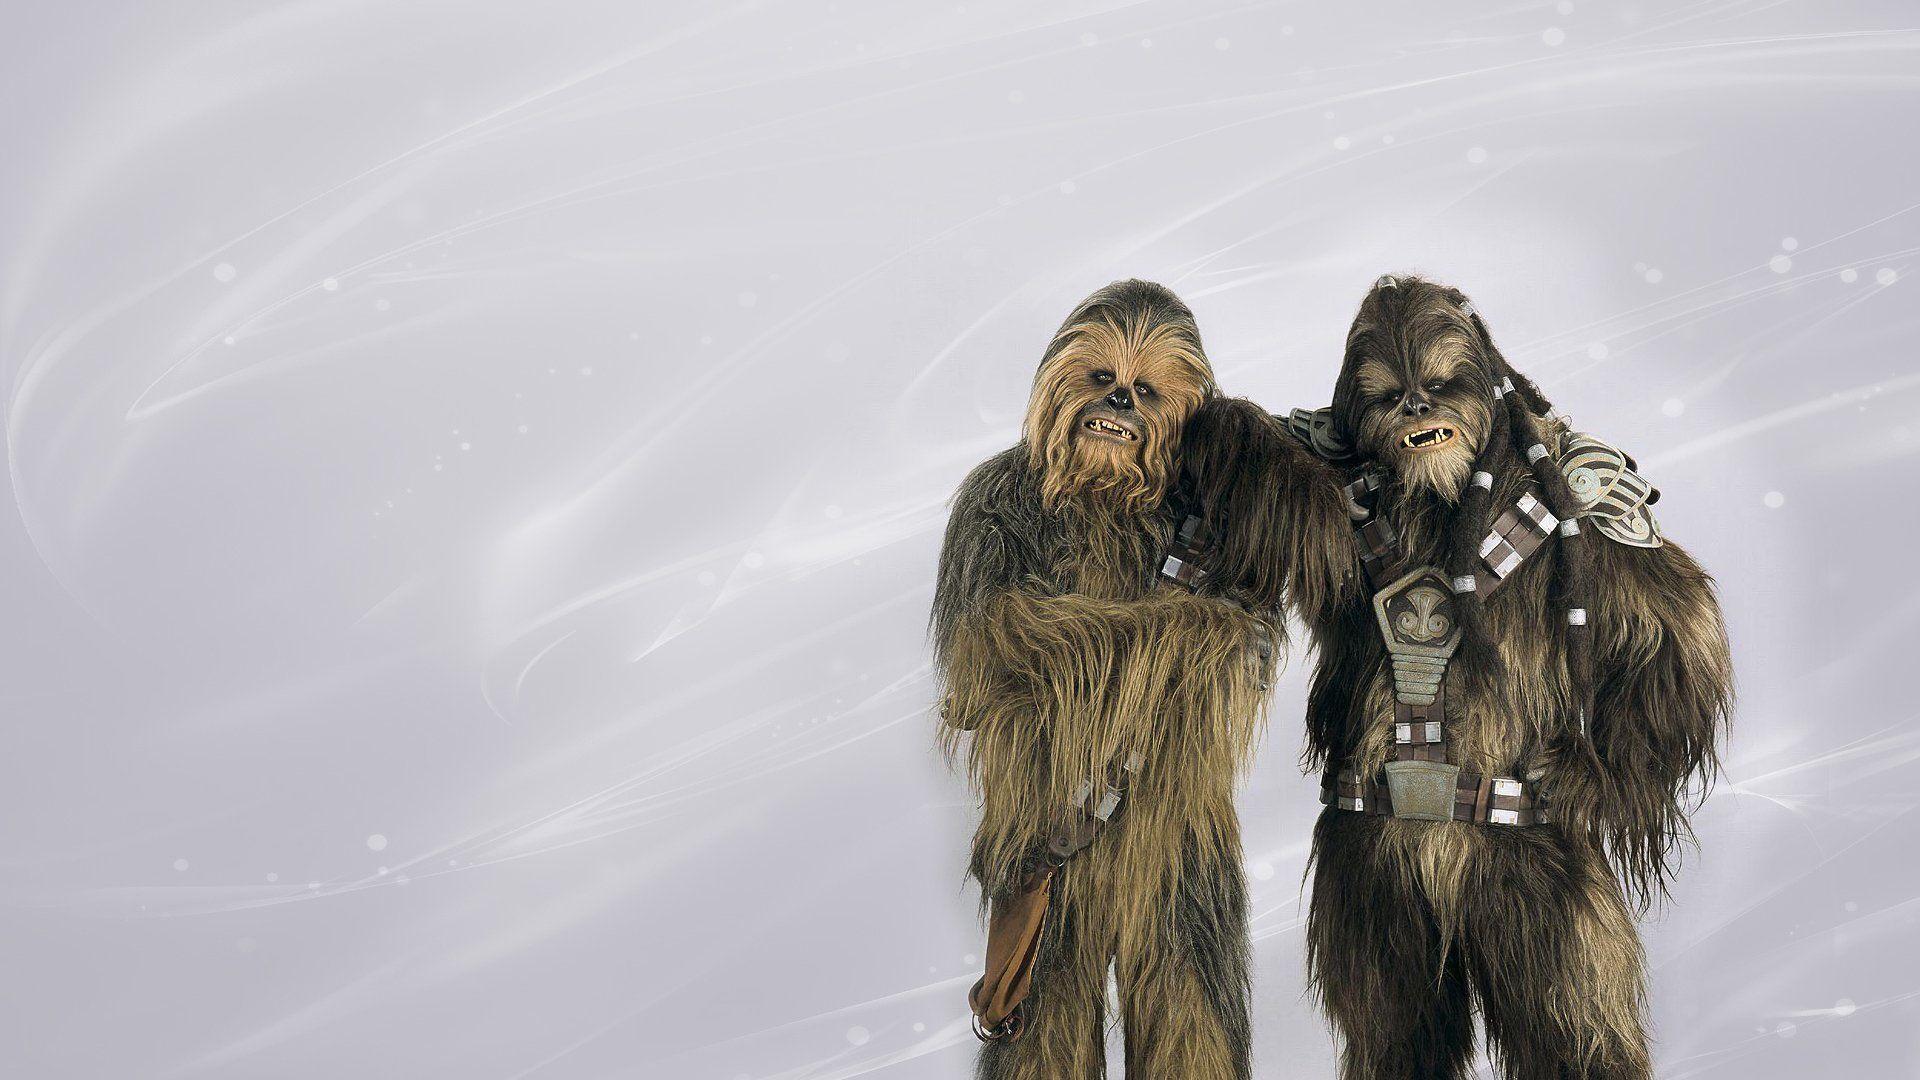 Chewbacca picture